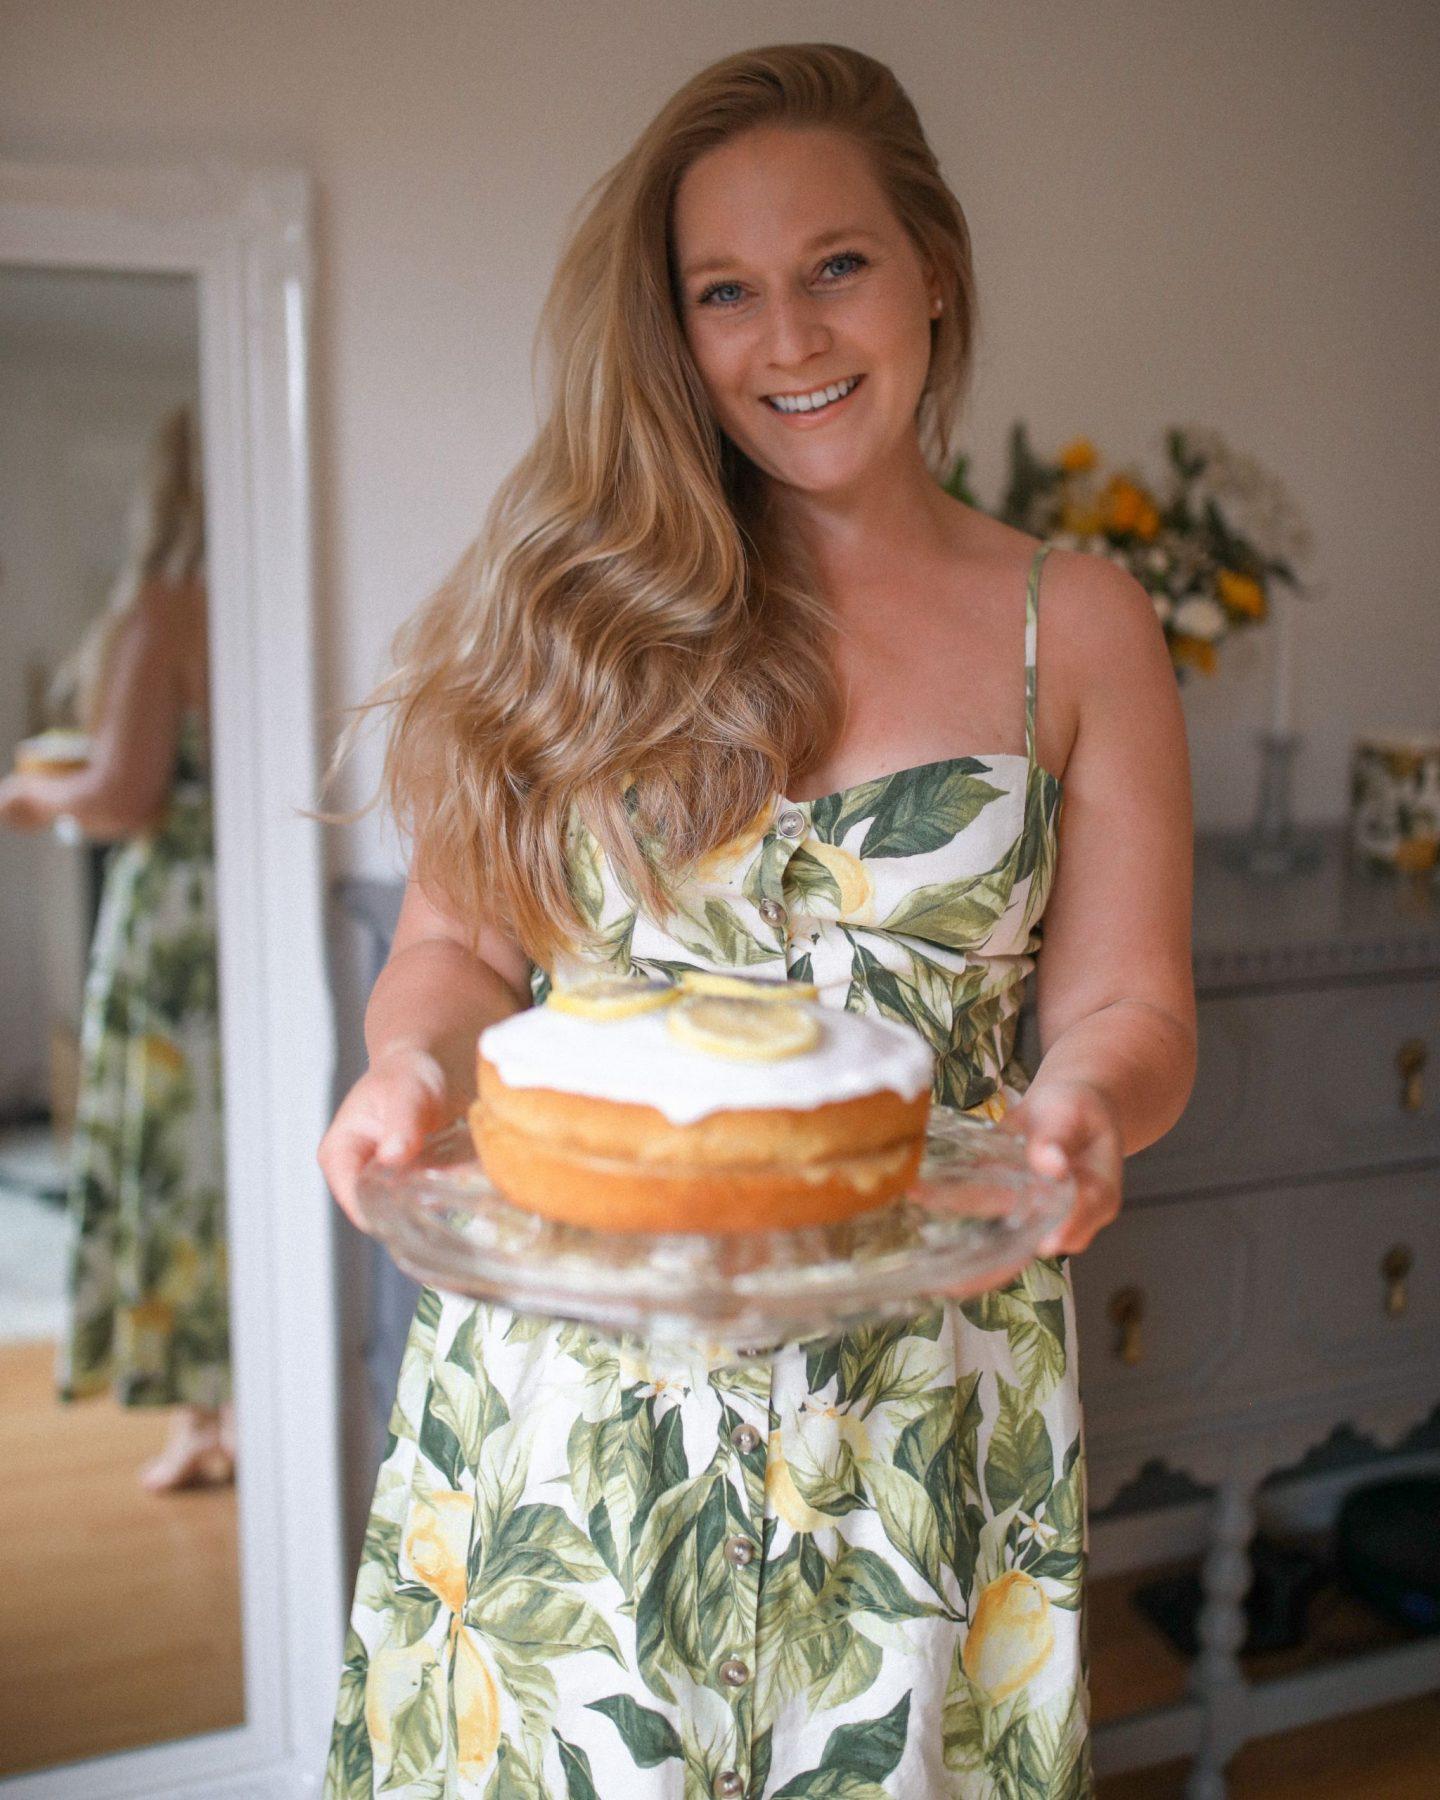 Iced Lemon and Poppy Seed Cake, Katie Heath, KALANCHOE